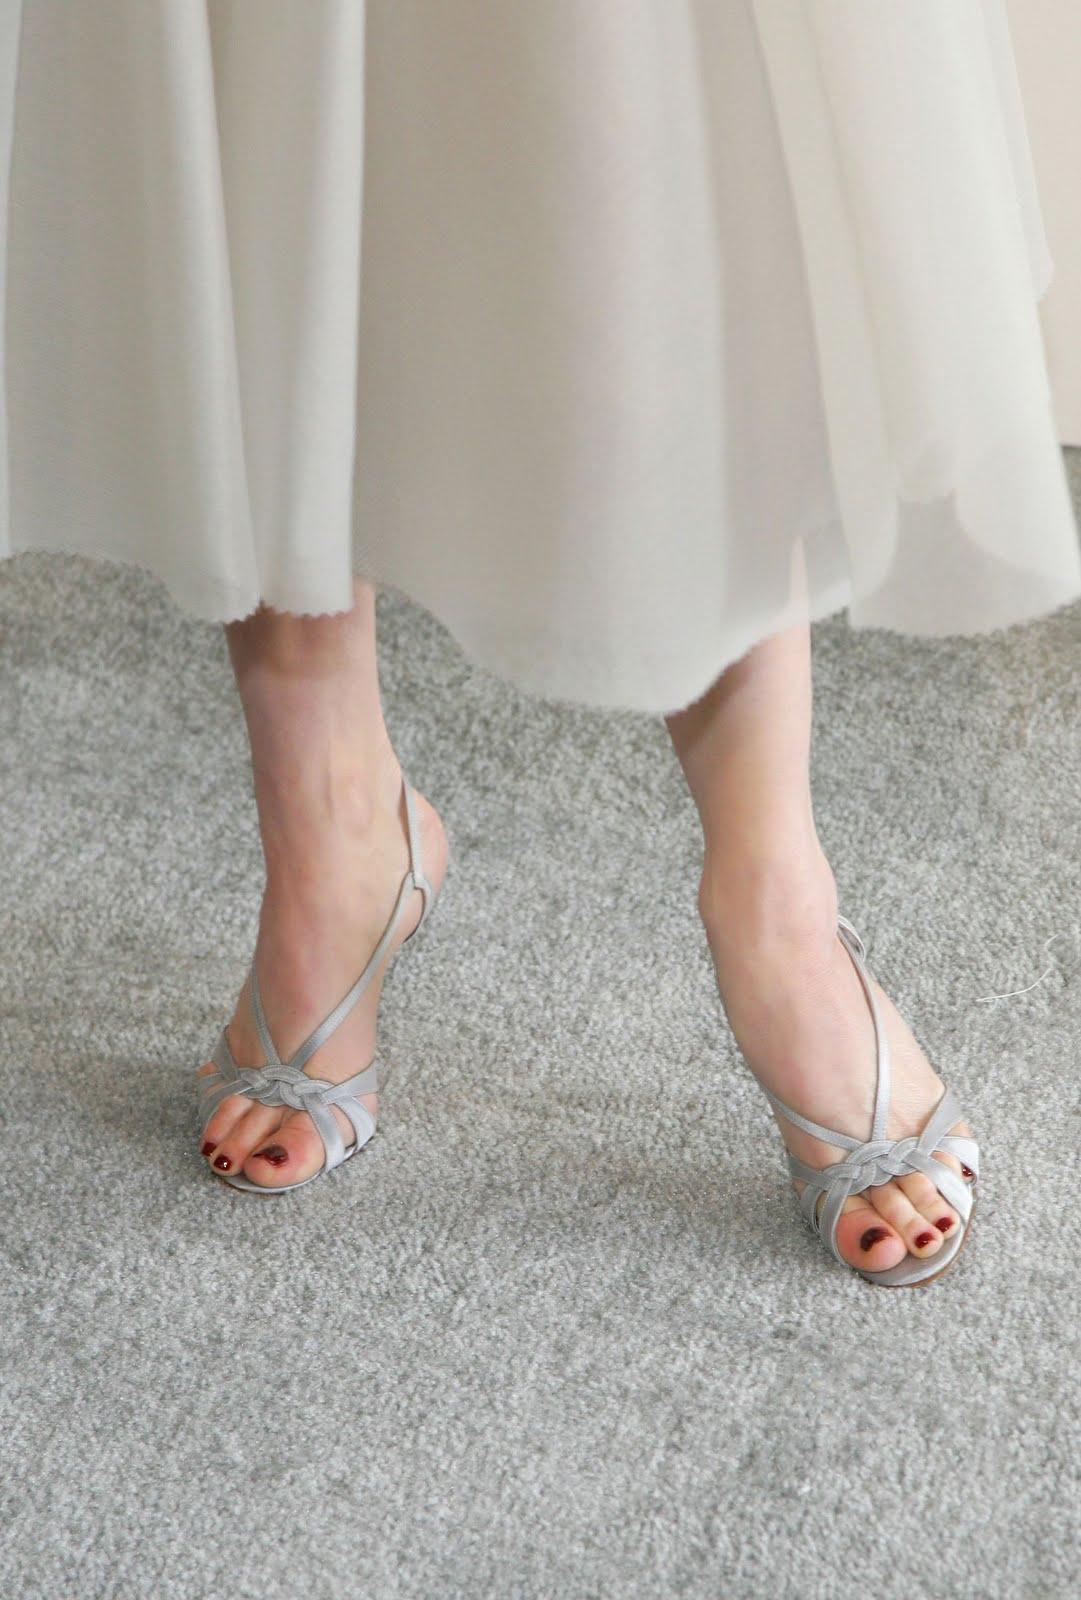 Bigfoot Celebrity: Dita von Teese Feet